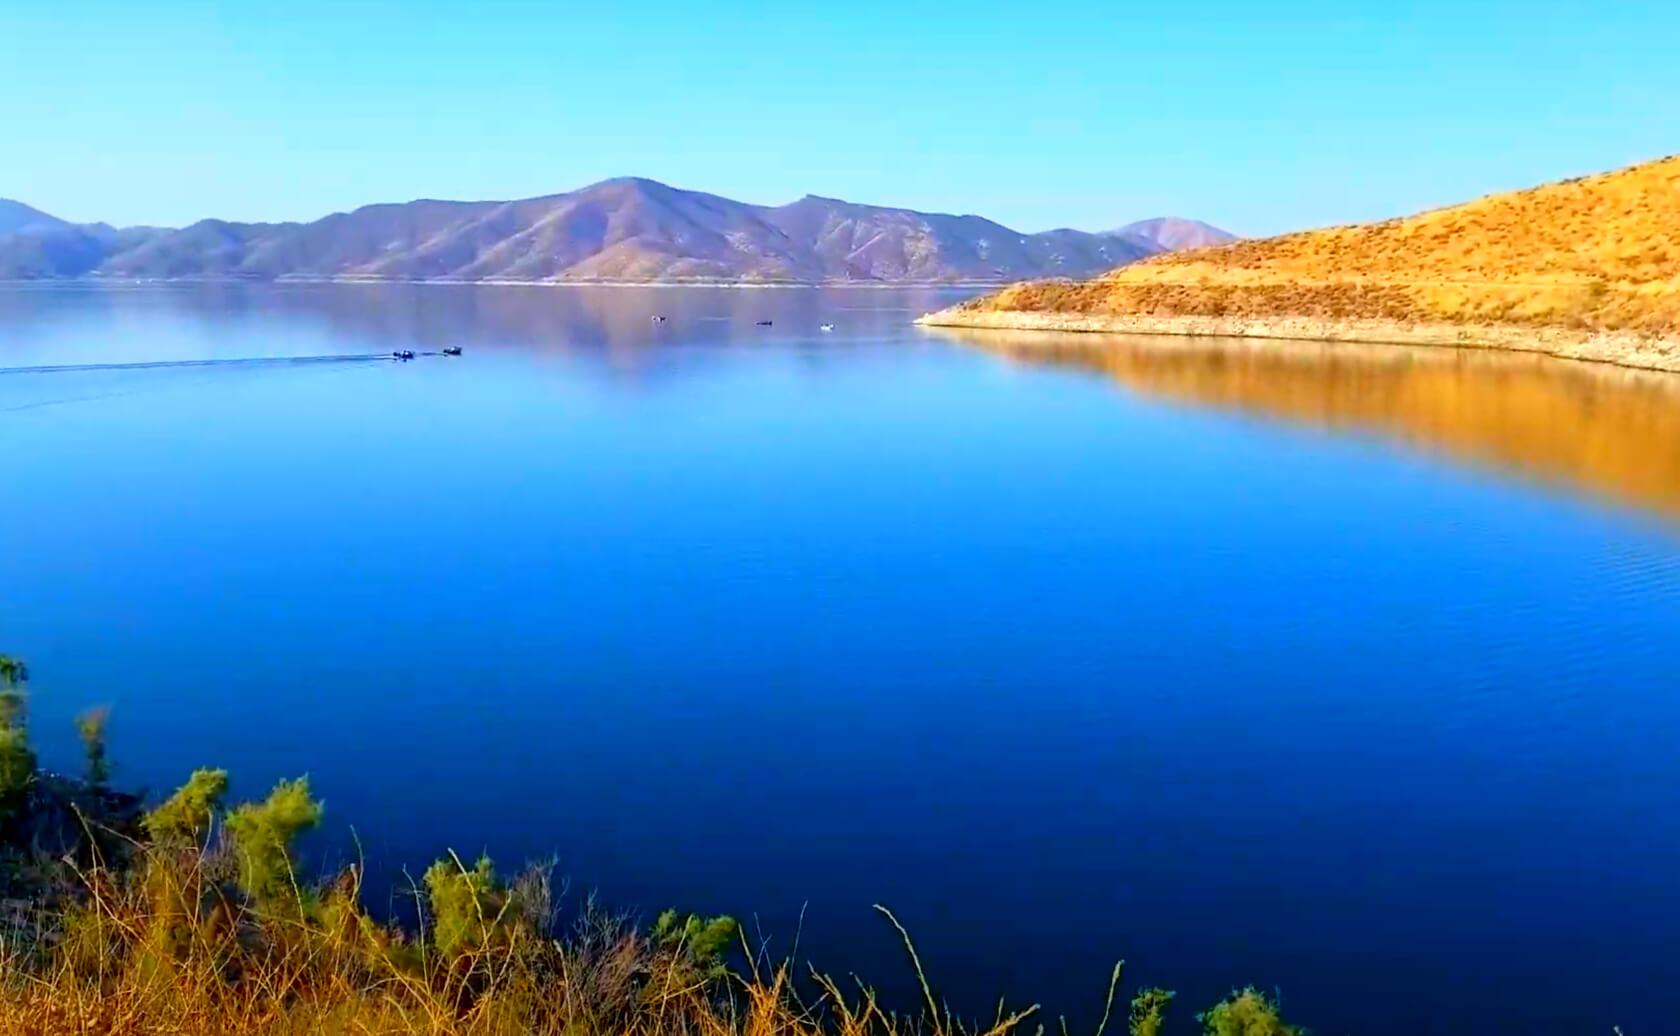 Diamond-Valley-Lake-Fishing-Guide-Report-Hemet-CA-03